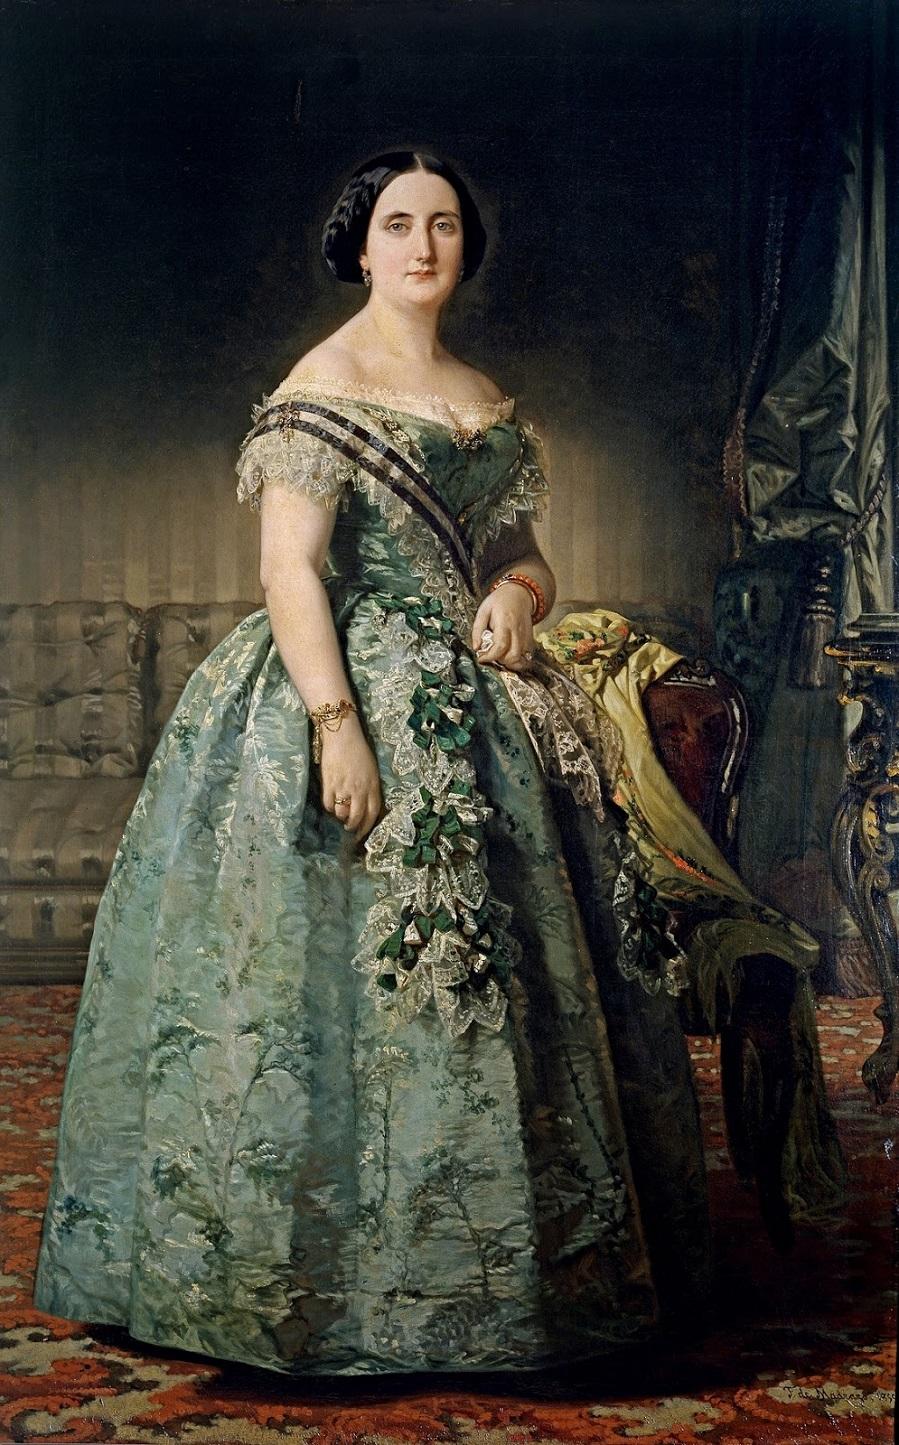 1855_Хосефа Коэльо Португальская (Josefa Coello de Portugal)_185 x 117_х.,м._Мадрид, музей Прадо.jpeg